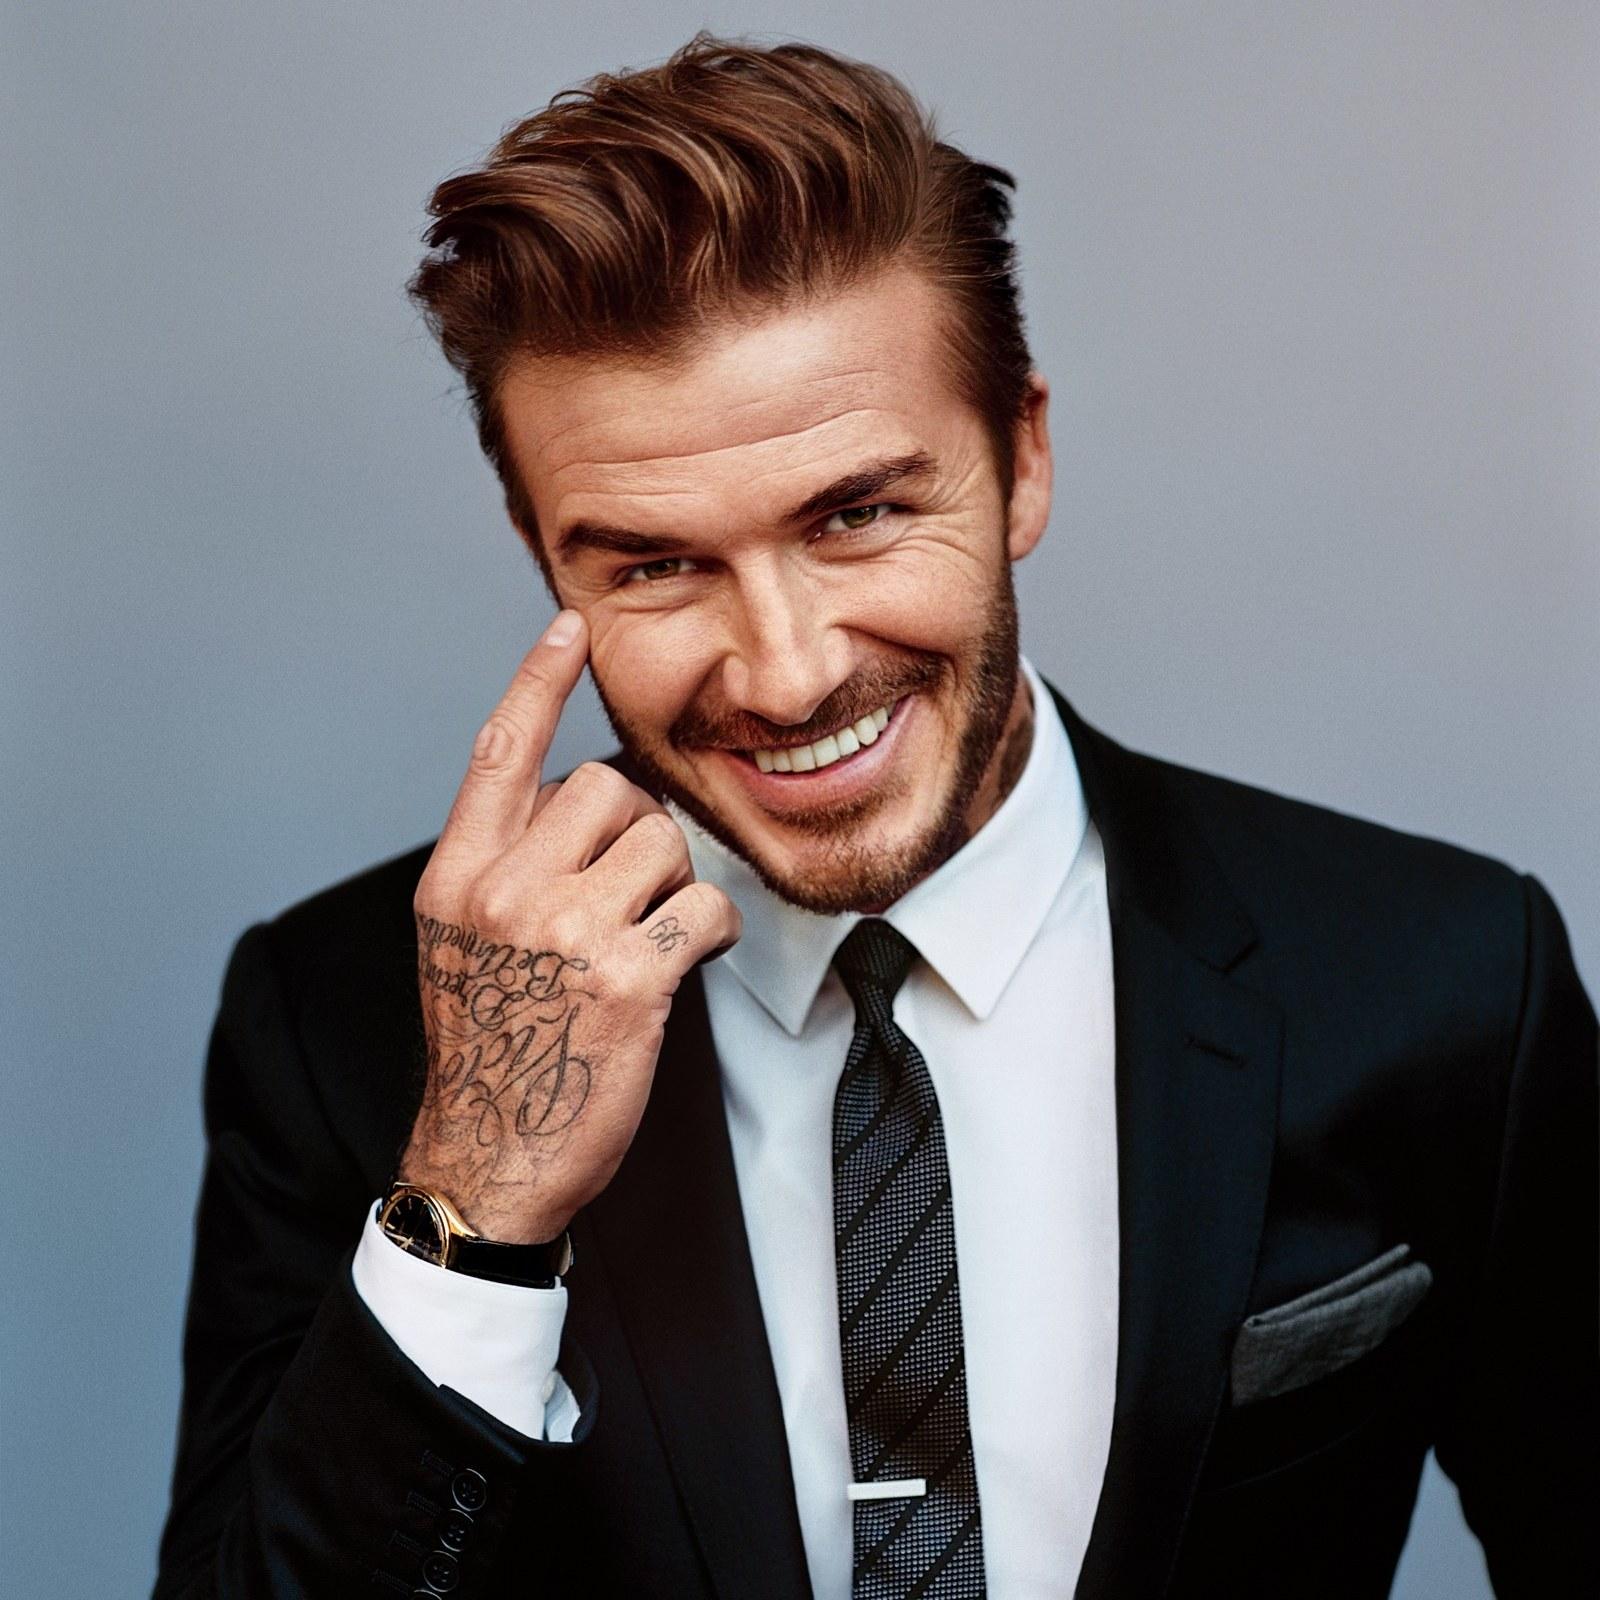 David Beckham British English Former Professional Footballer